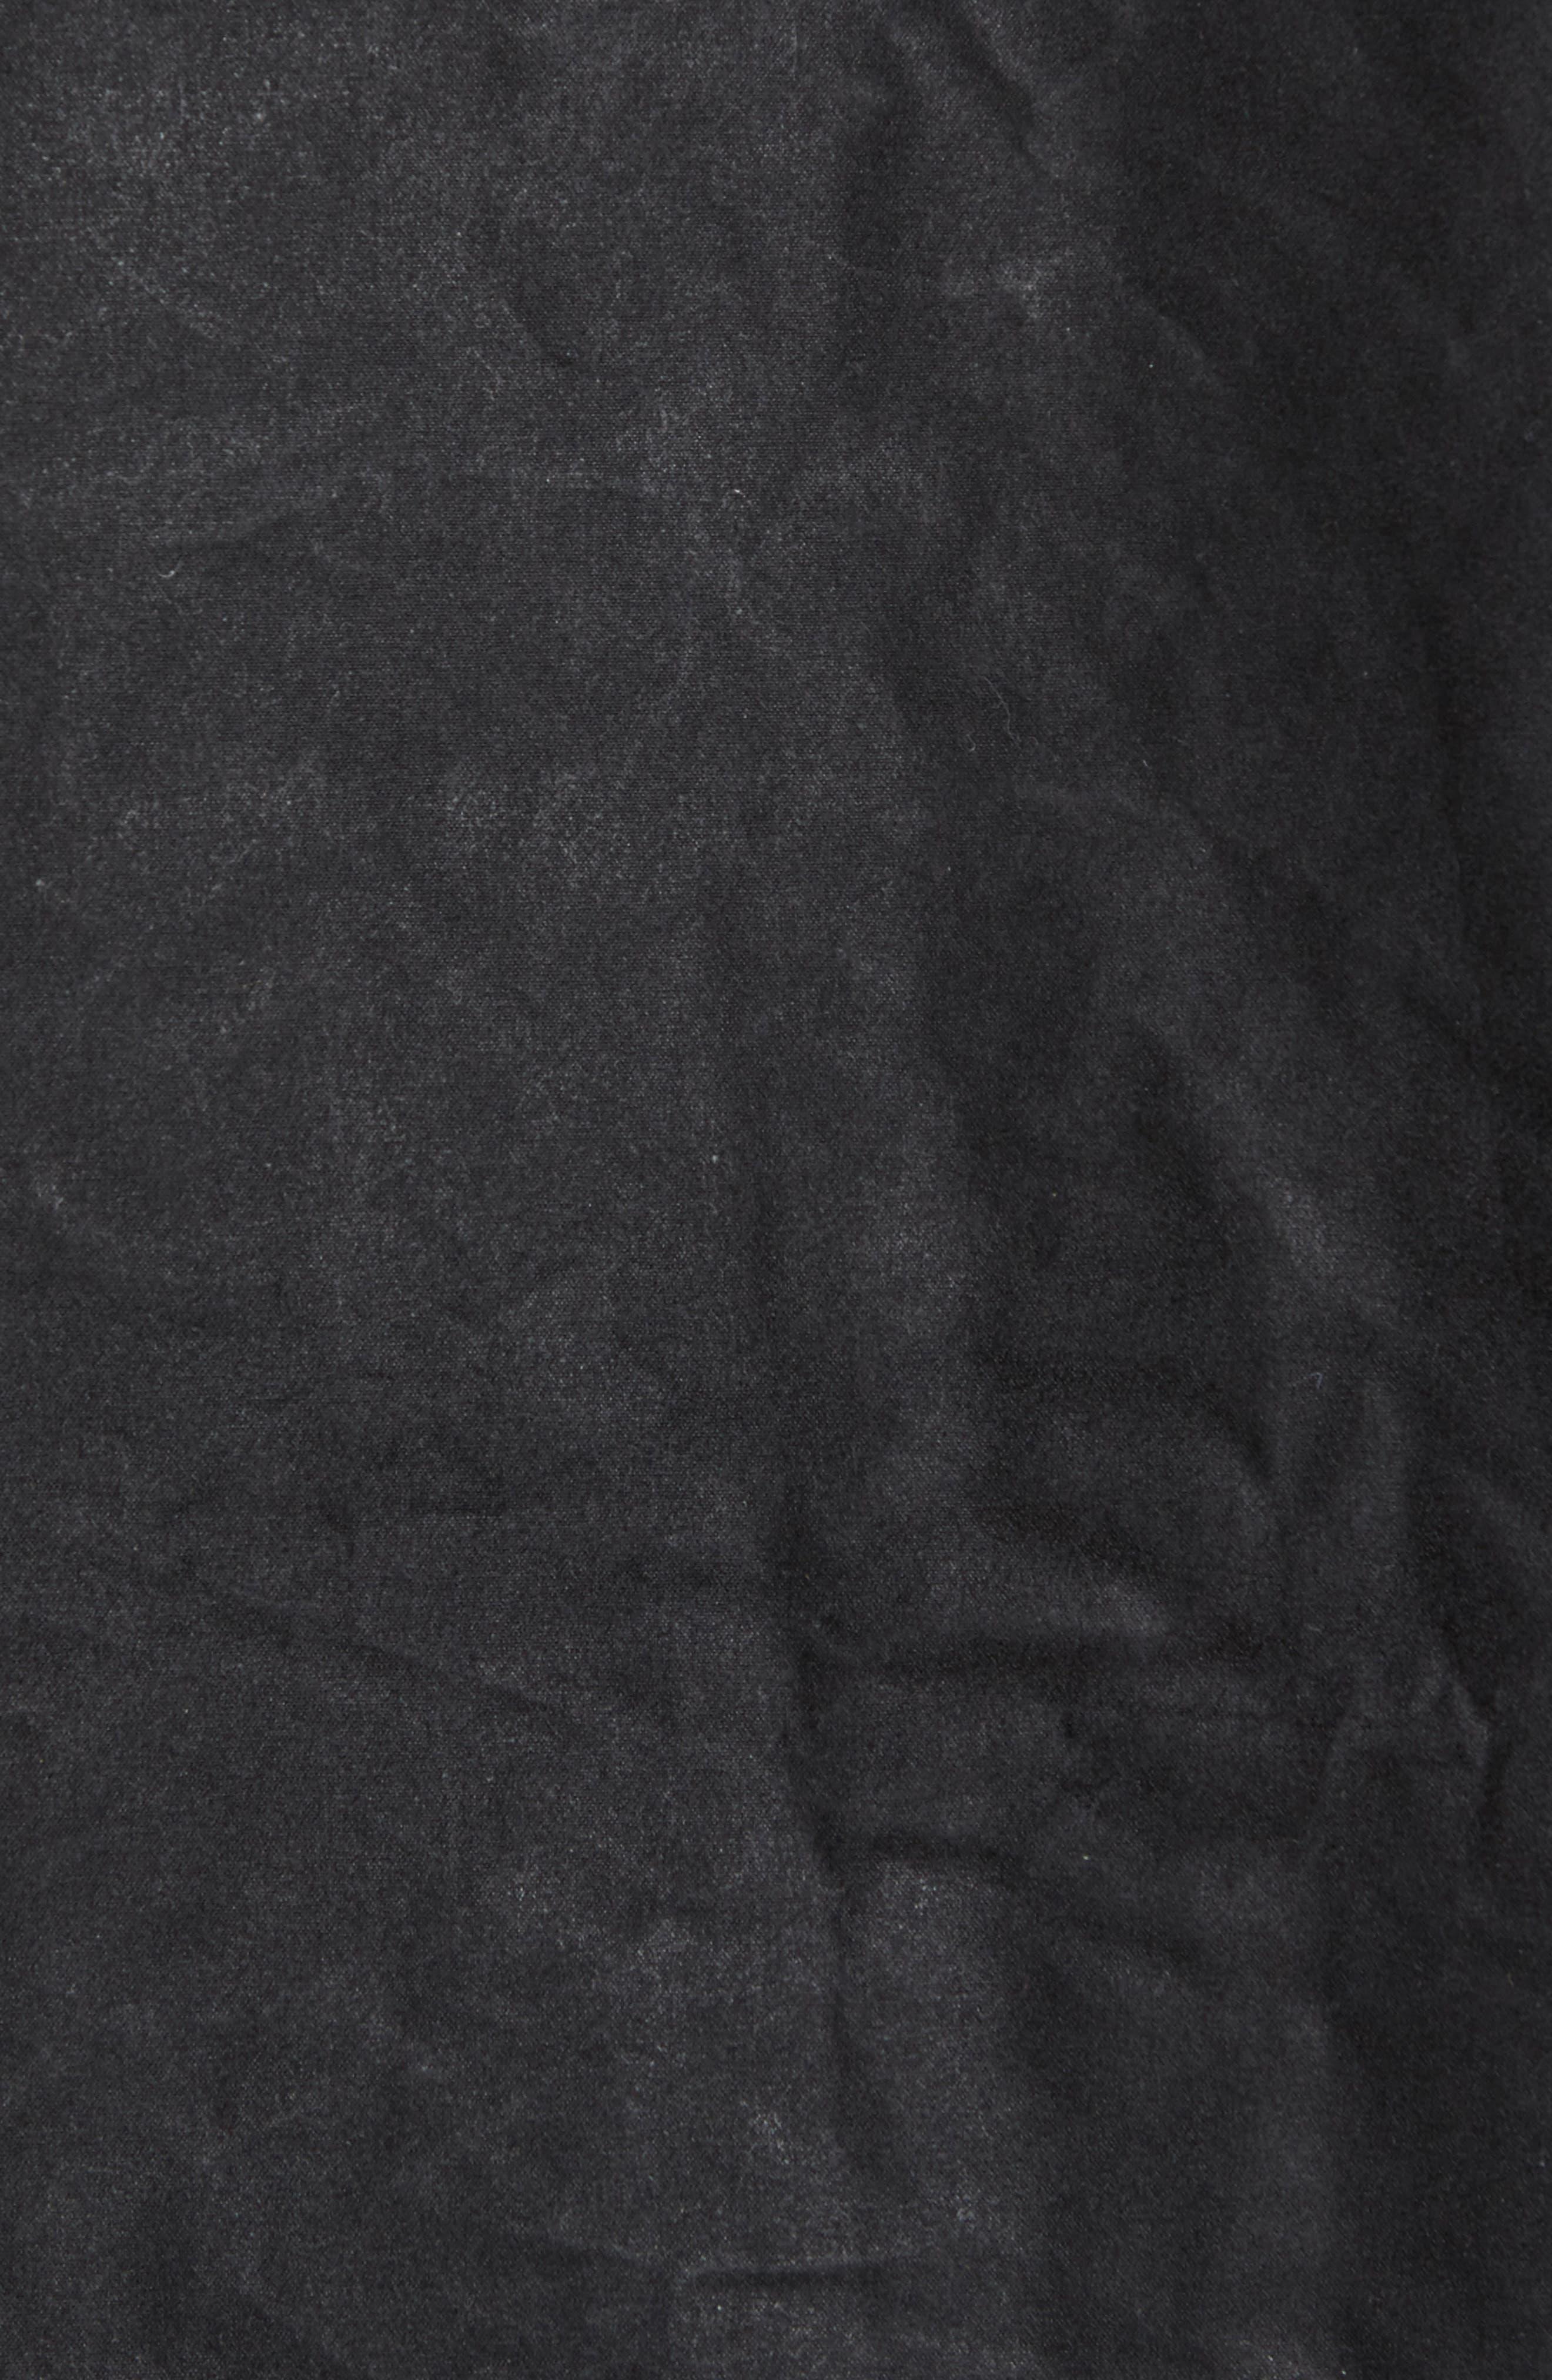 Chrome Slim Fit Water Repellent Jacket,                             Alternate thumbnail 5, color,                             Black